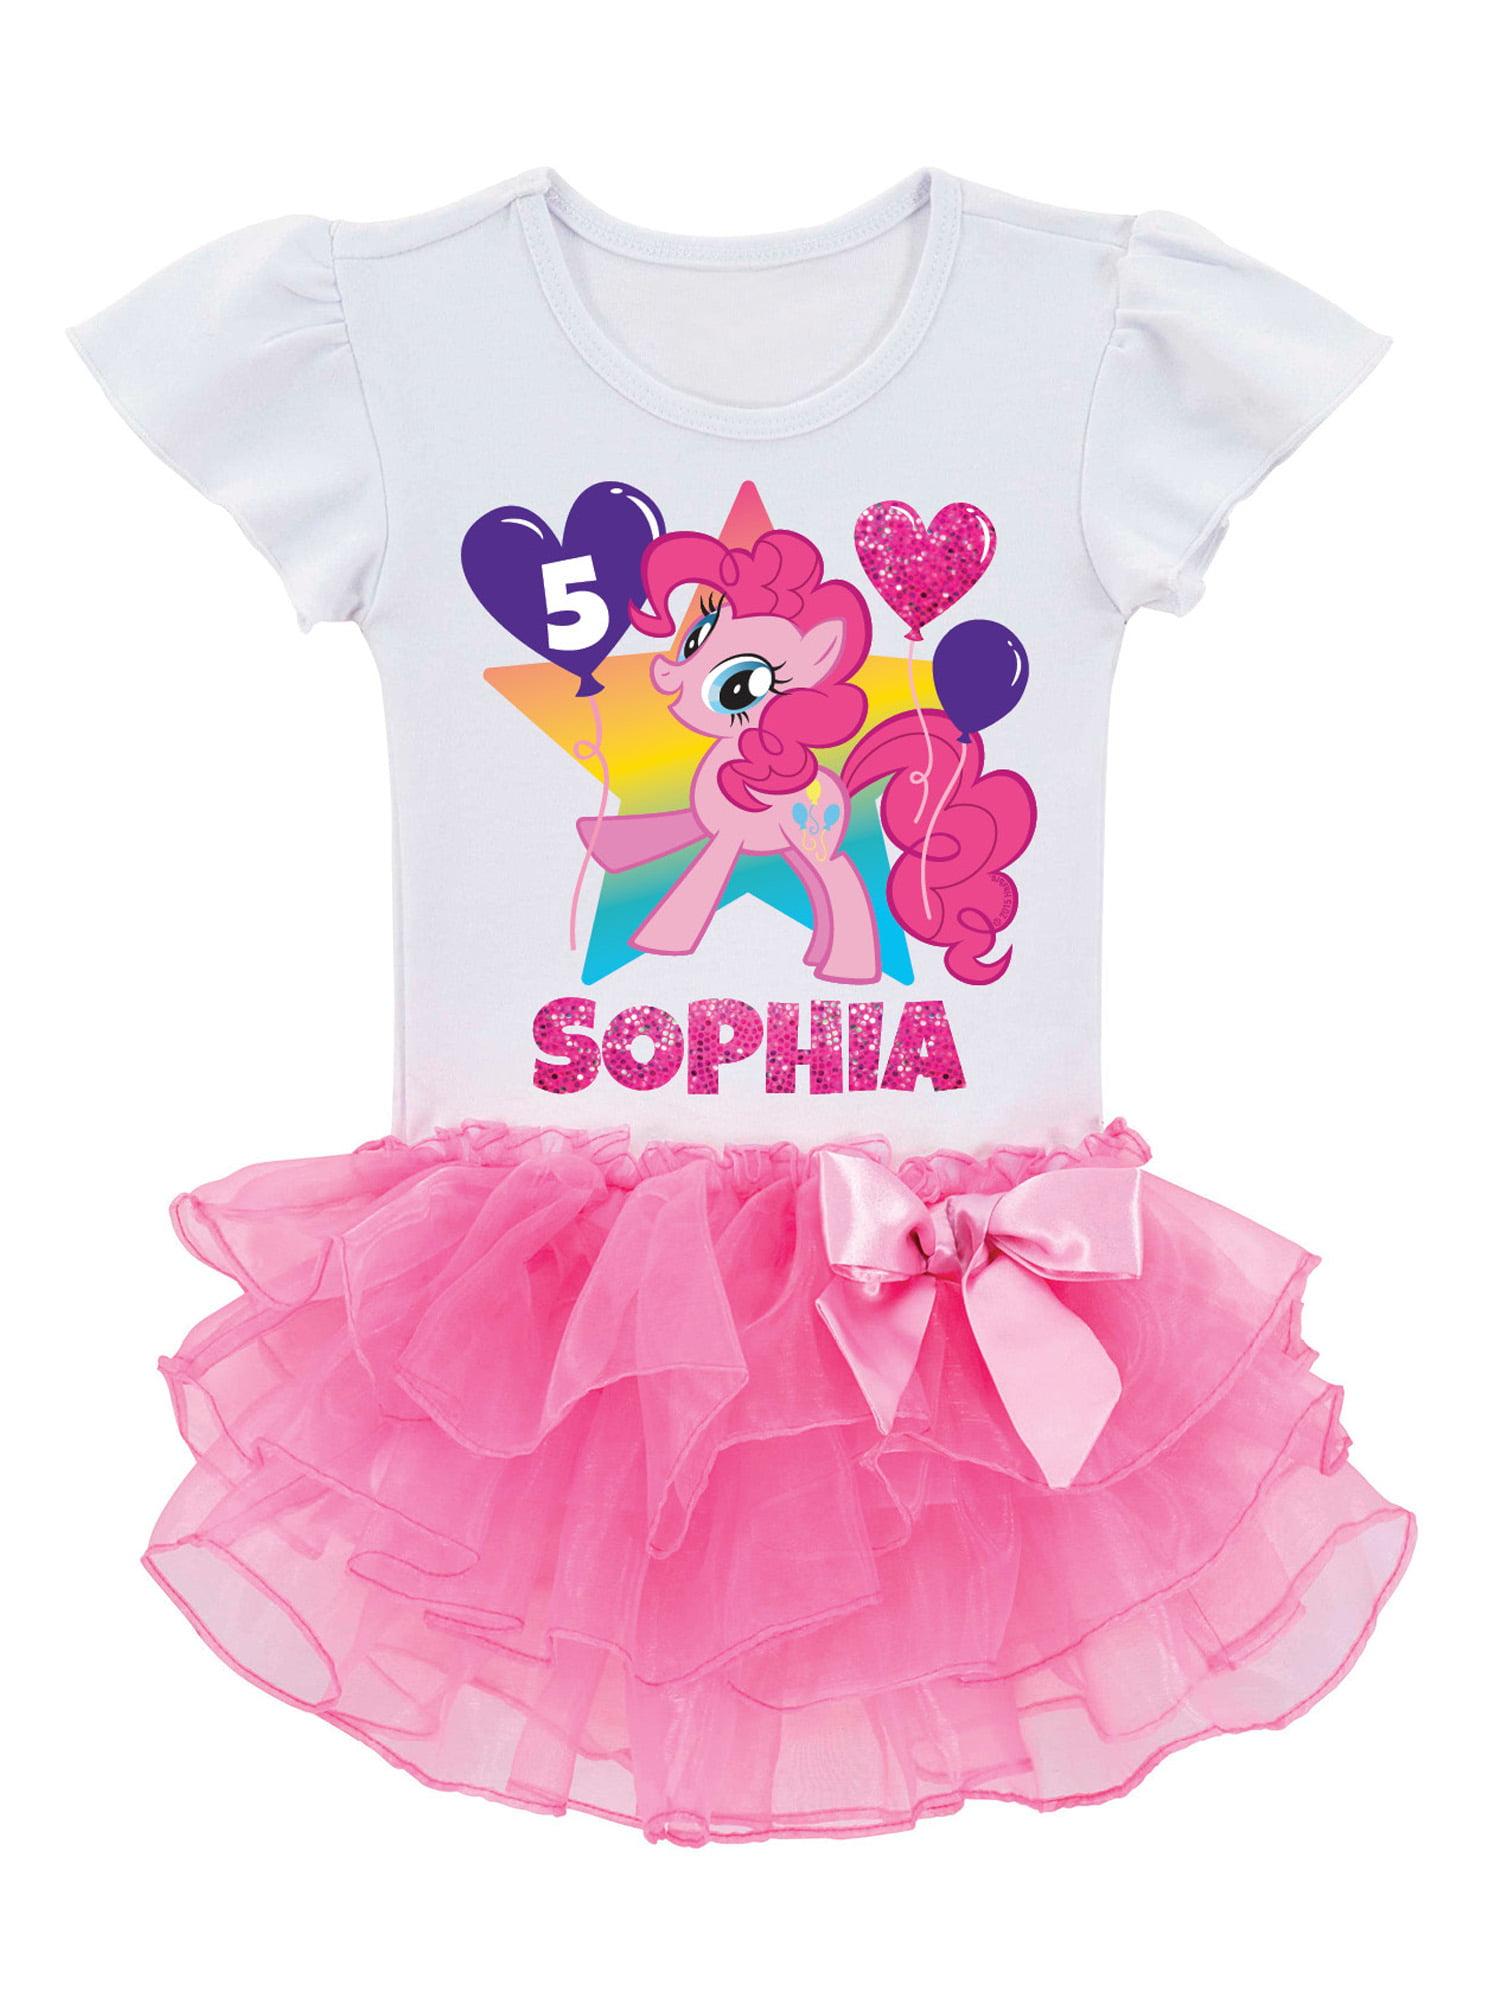 Personalized My Little Pony Pinkie Pie Birthday Toddler Girls Tutu T Shirt